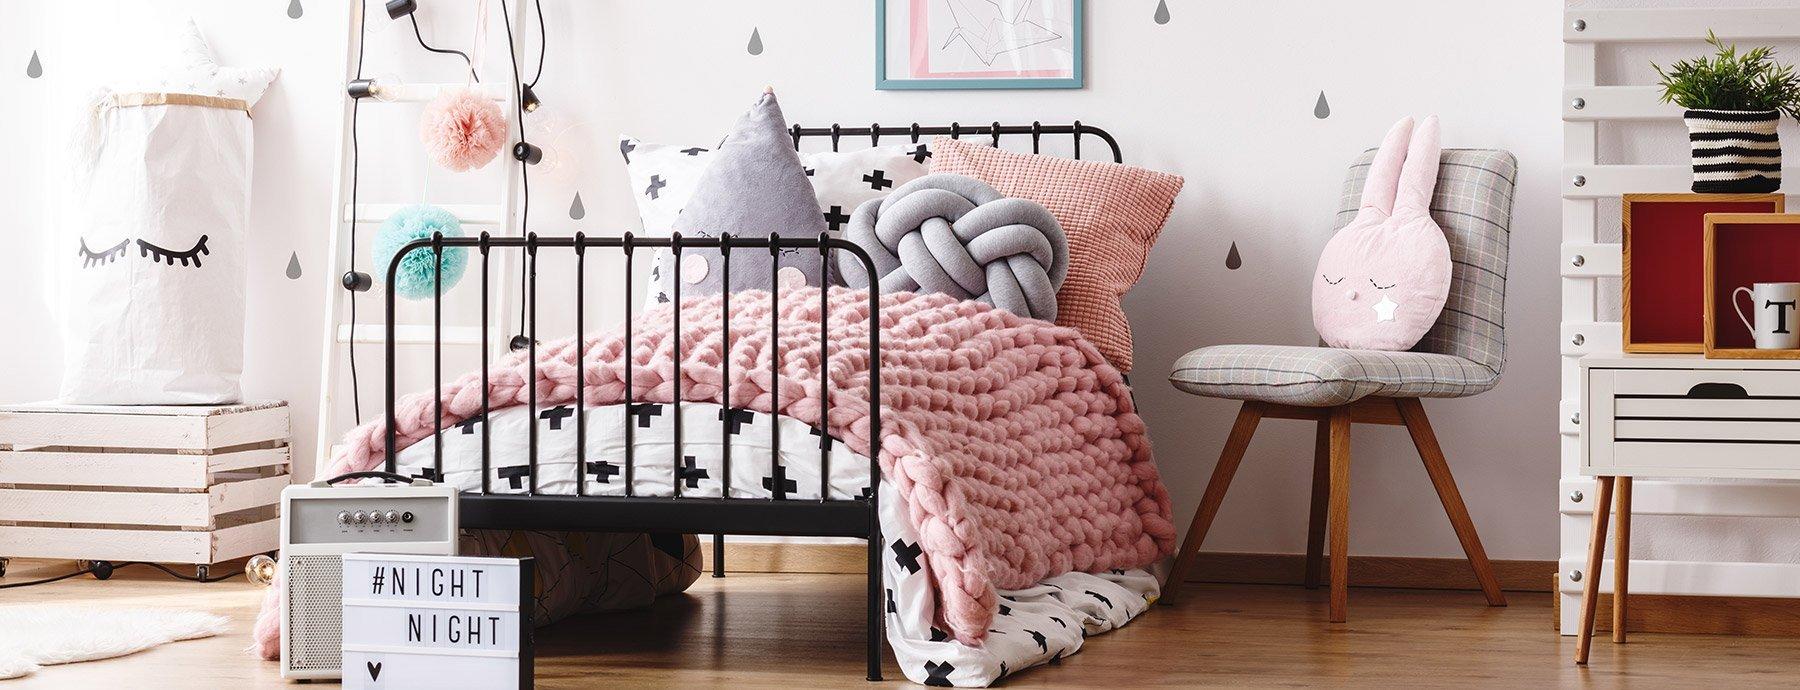 Girl Bedroom Decorating Ideas Inspirational the Best Girl Bedroom Ideas